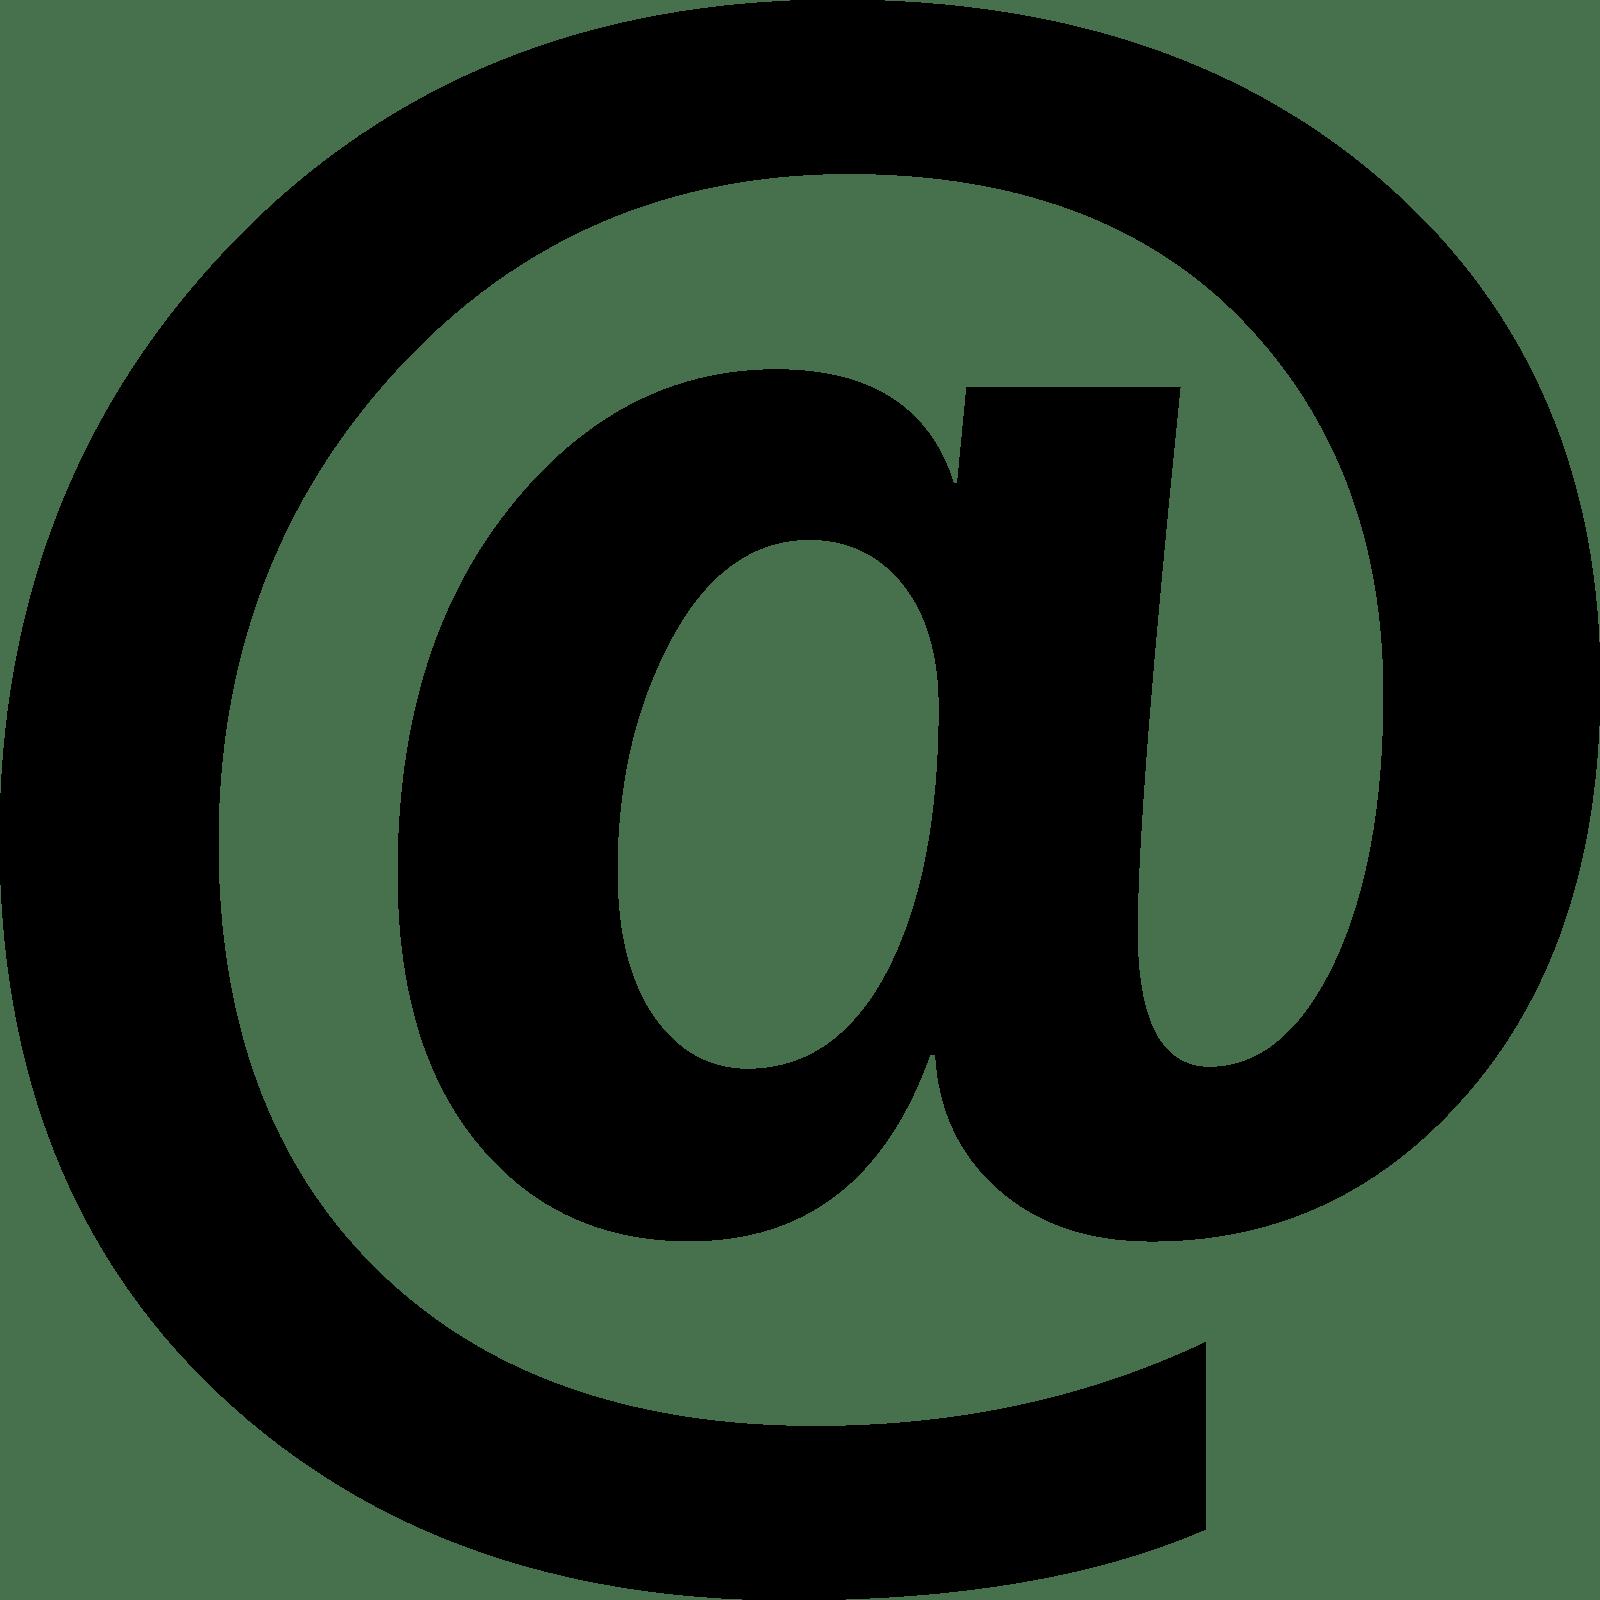 symbole email cv